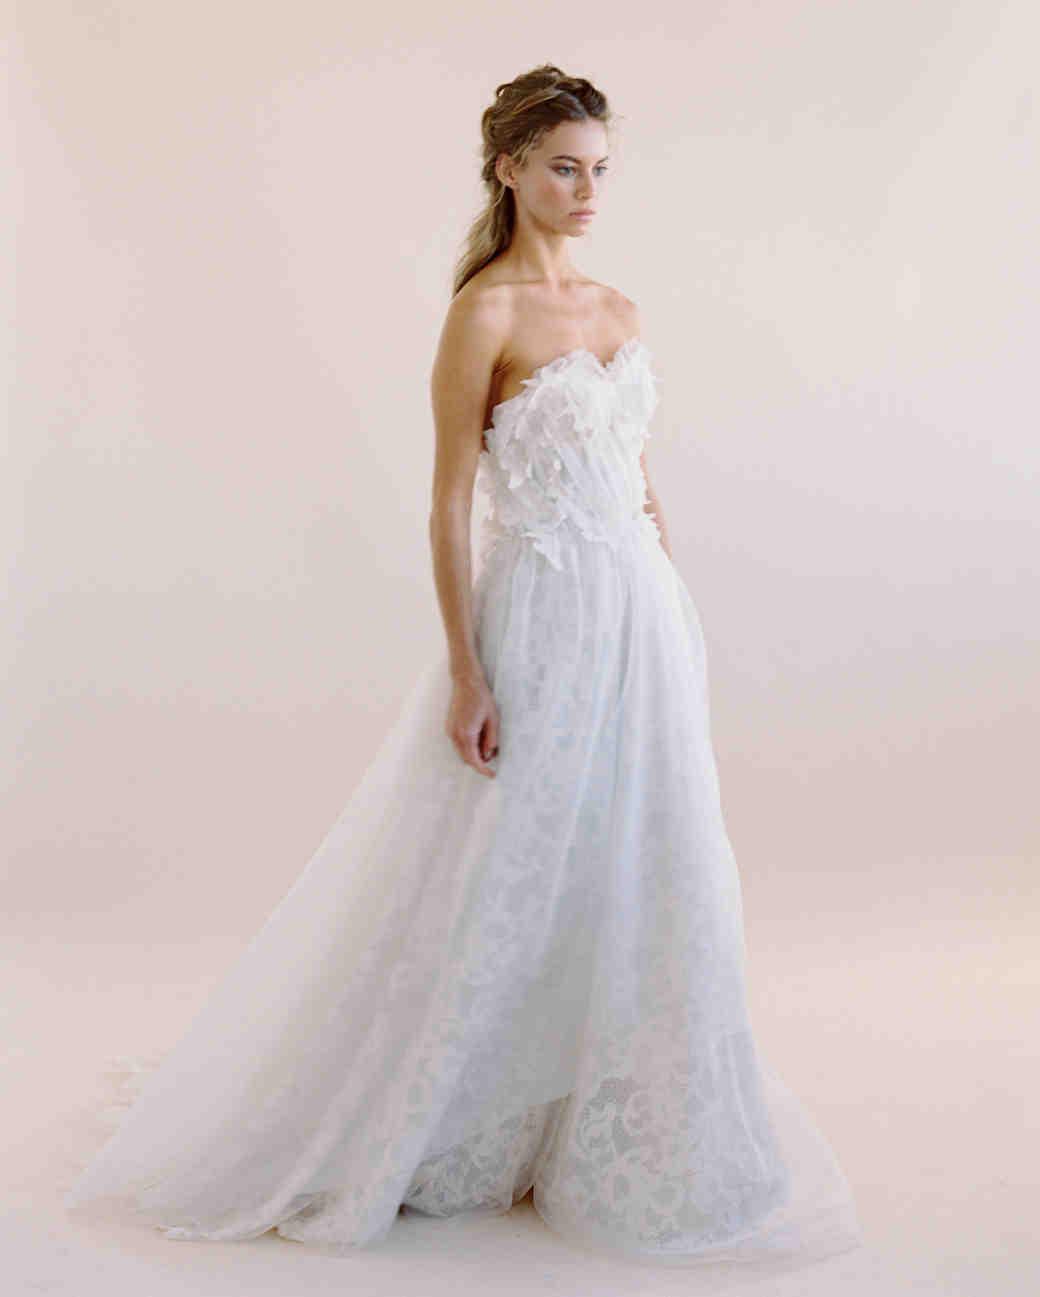 Audrey Hepburn Inspired Wedding Dresses 47 Fresh Samuelle Couture Fall Wedding